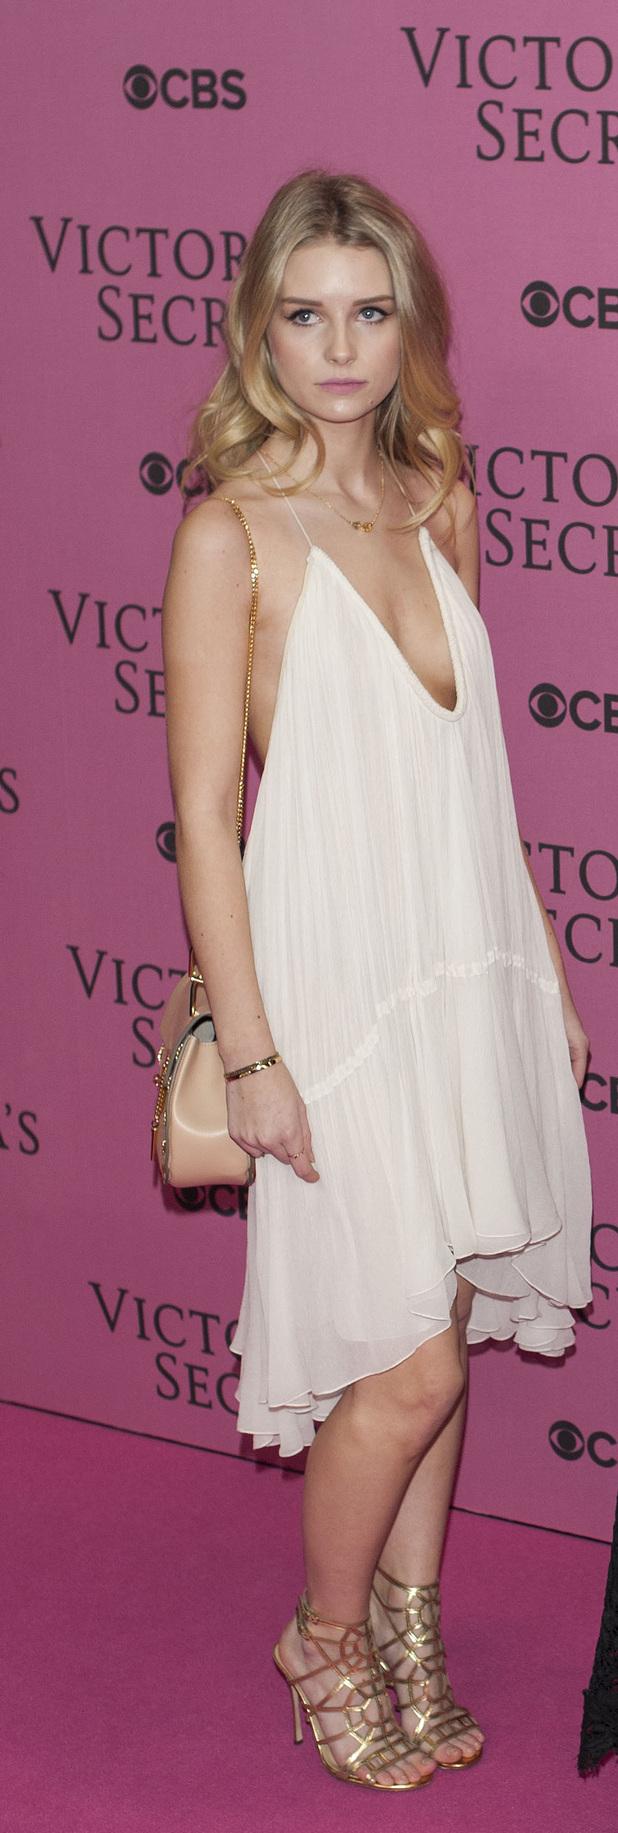 Lottie Moss Victoria's Secret Fashion Show held at the Earls Court Exhibition Centre